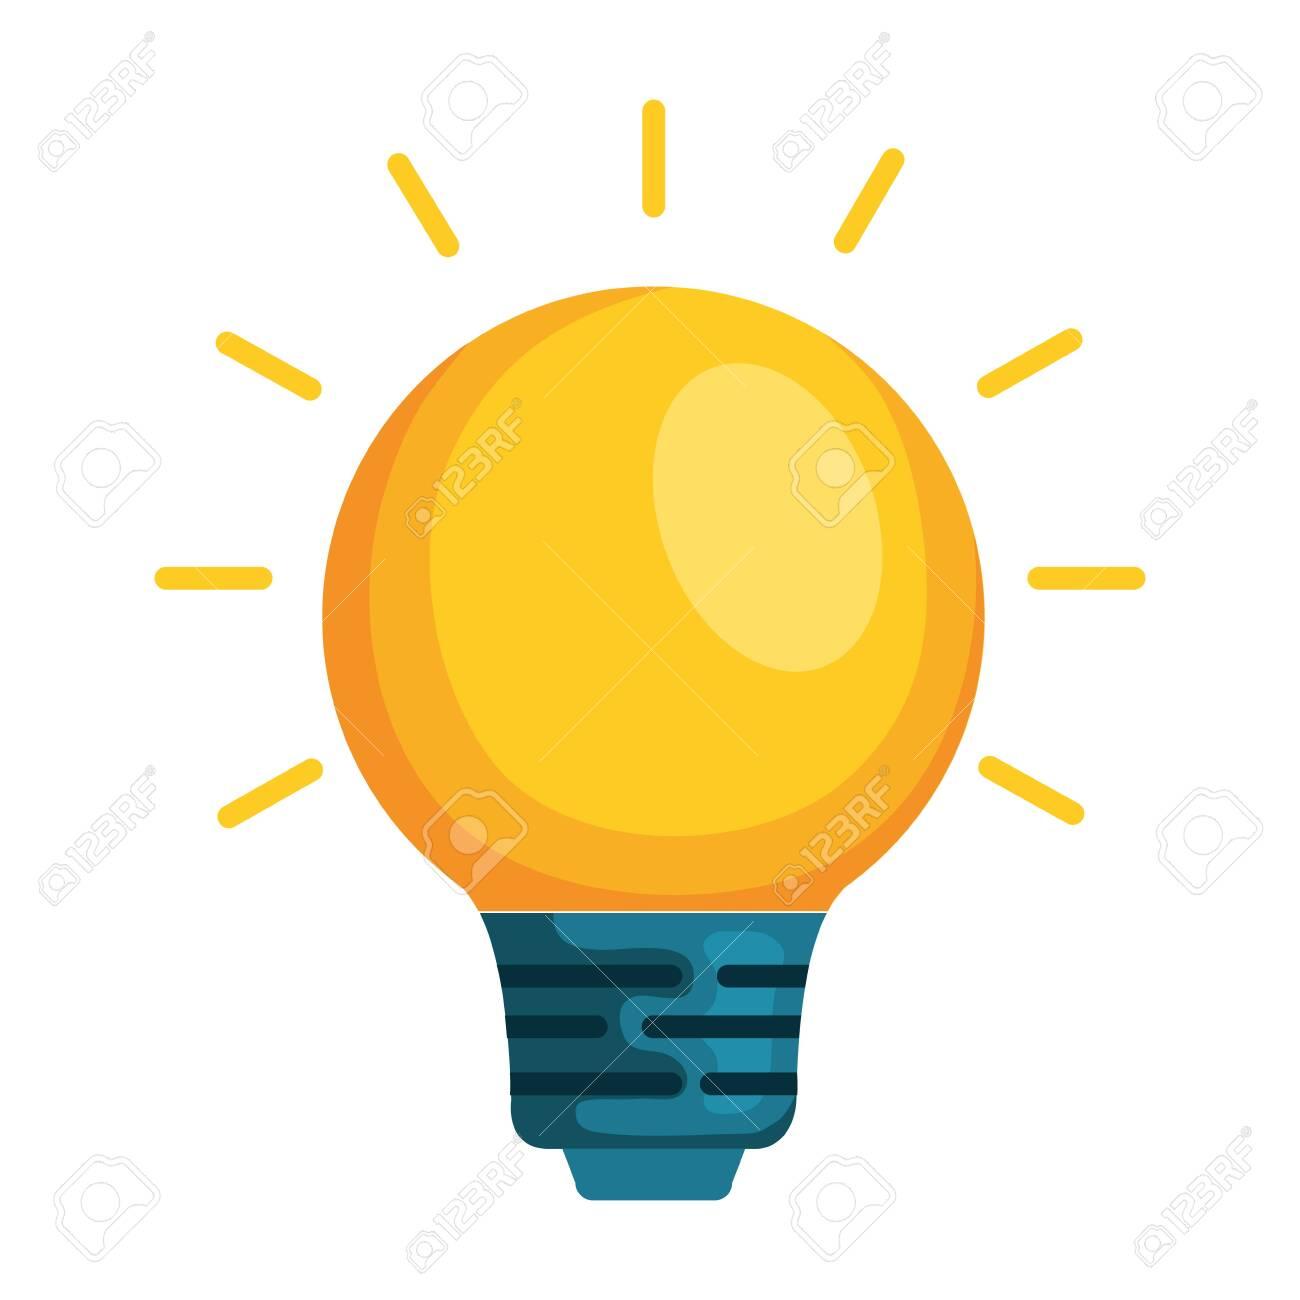 bulb light isolated icon vector illustration design - 129795717